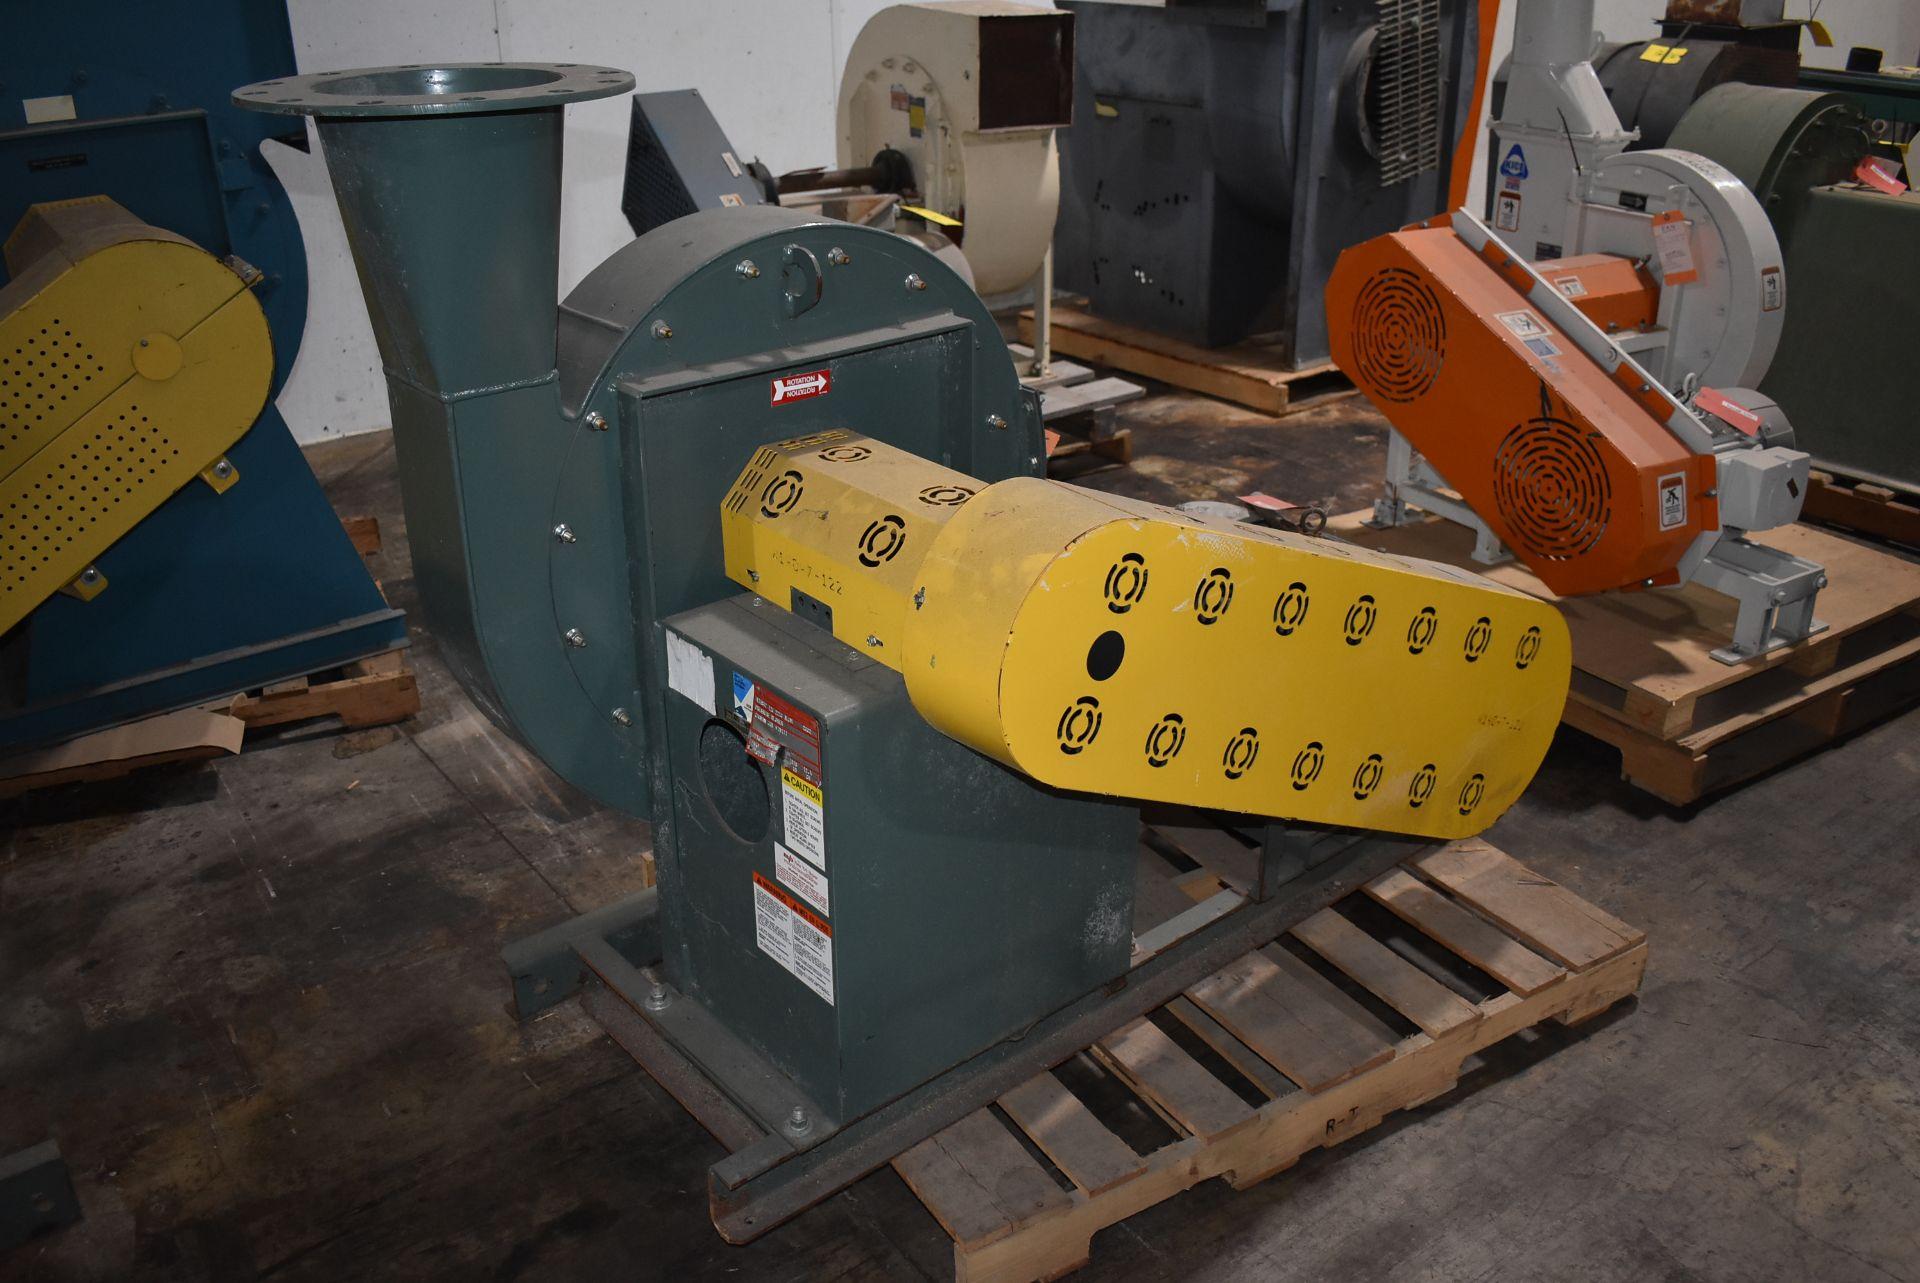 New York Blower, Wheel Size 2210 Aluminum w/15 HP Motor - Image 3 of 3